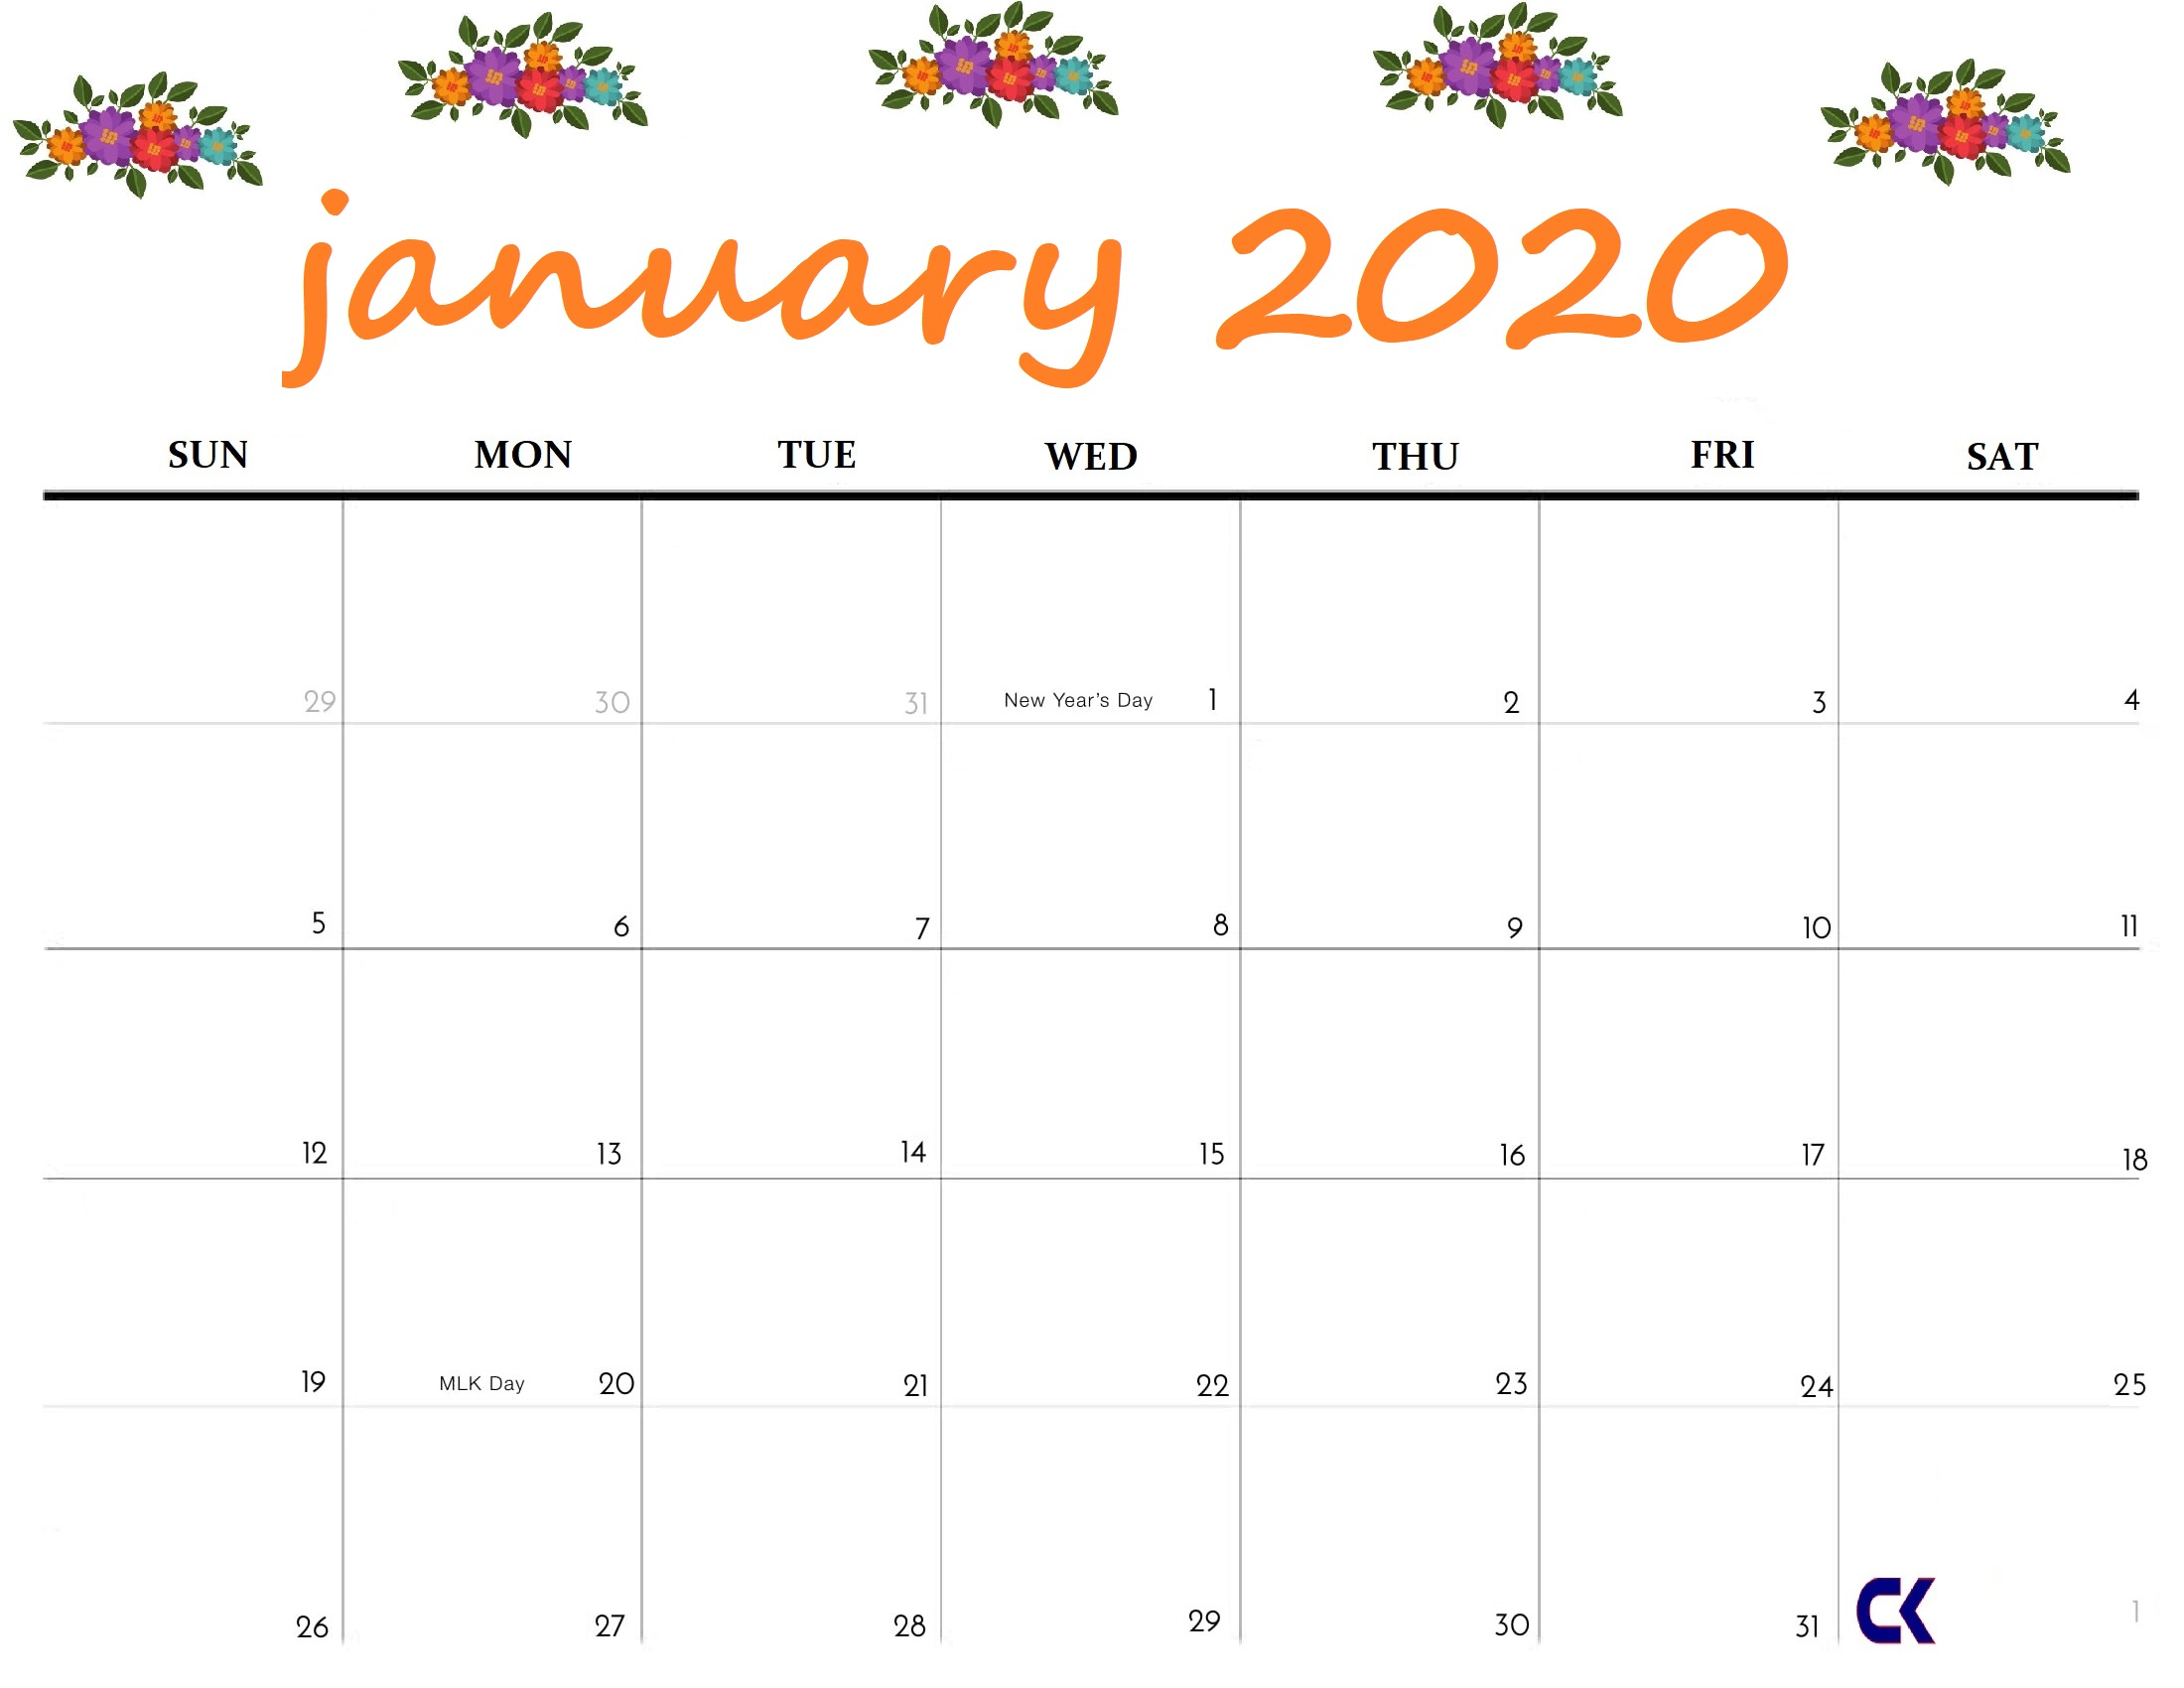 Printable January 2020 Calendar  Calendarkart throughout Jan 2020 Printable Calendar